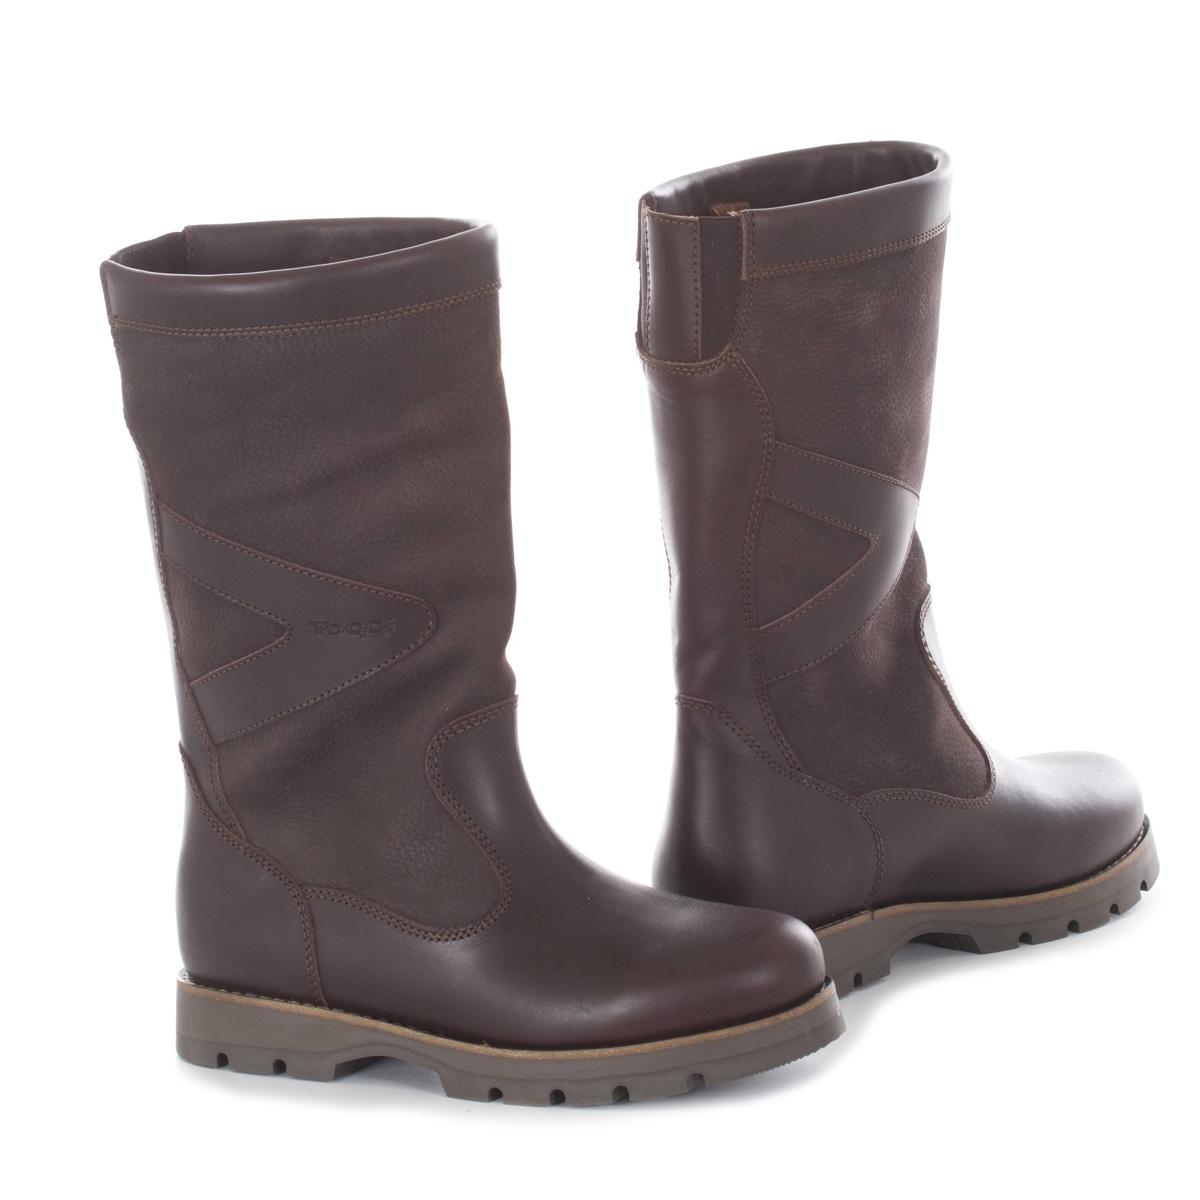 toggi boots image of toggi caledon waterproof country